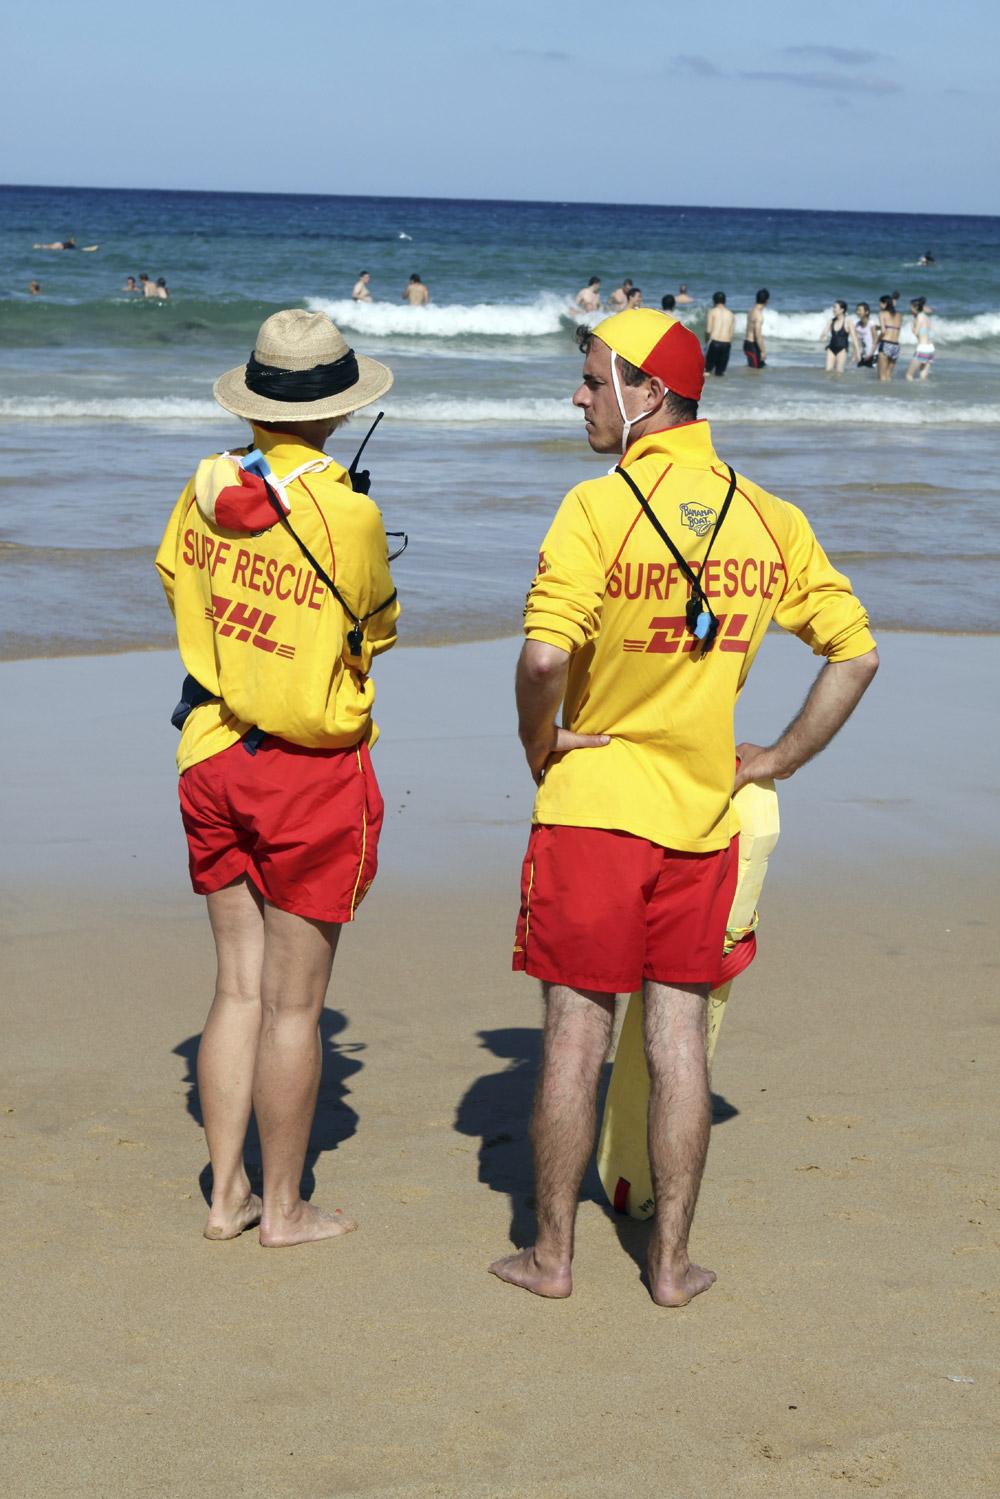 Manly Beach Sydney, Australia